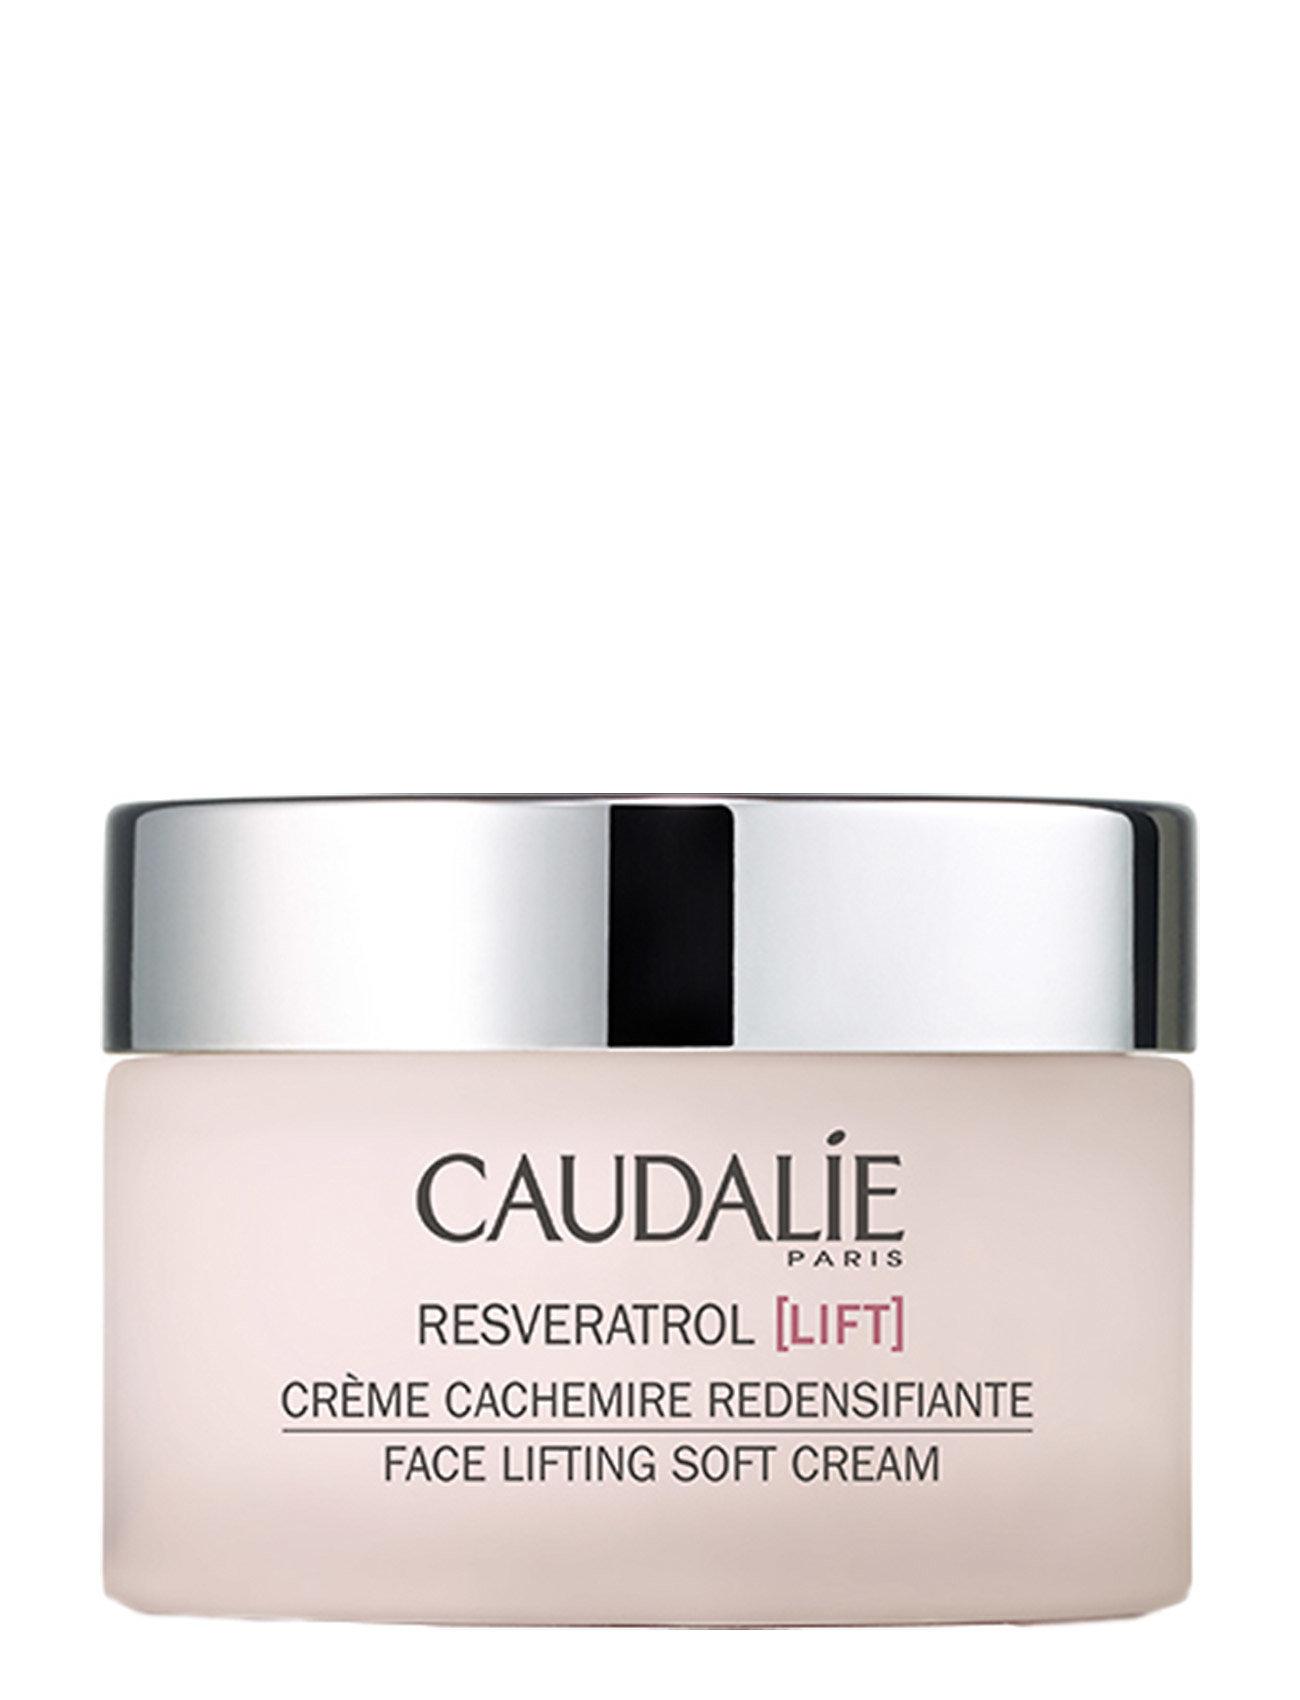 Image of ResvéRatrol Face Lifting Soft Cream Beauty WOMEN Skin Care Face Day Creams Nude CAUDALIE (3423514841)